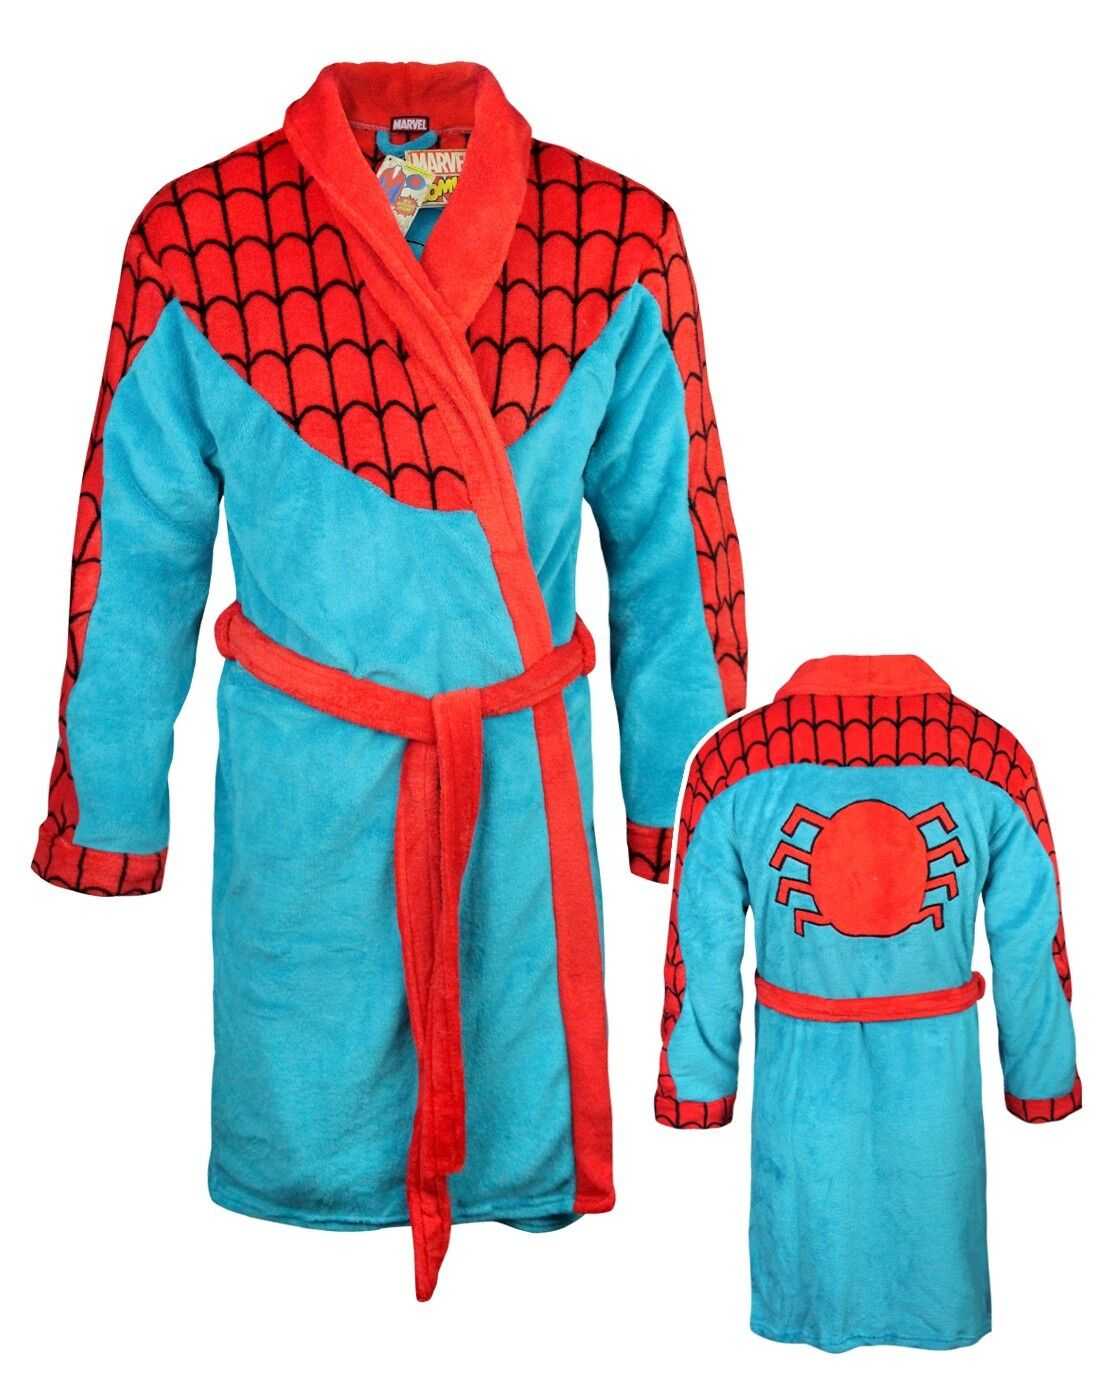 Männer - offizielle marvel spiderman morgenrock - erstbezug großes geschenk bademantel